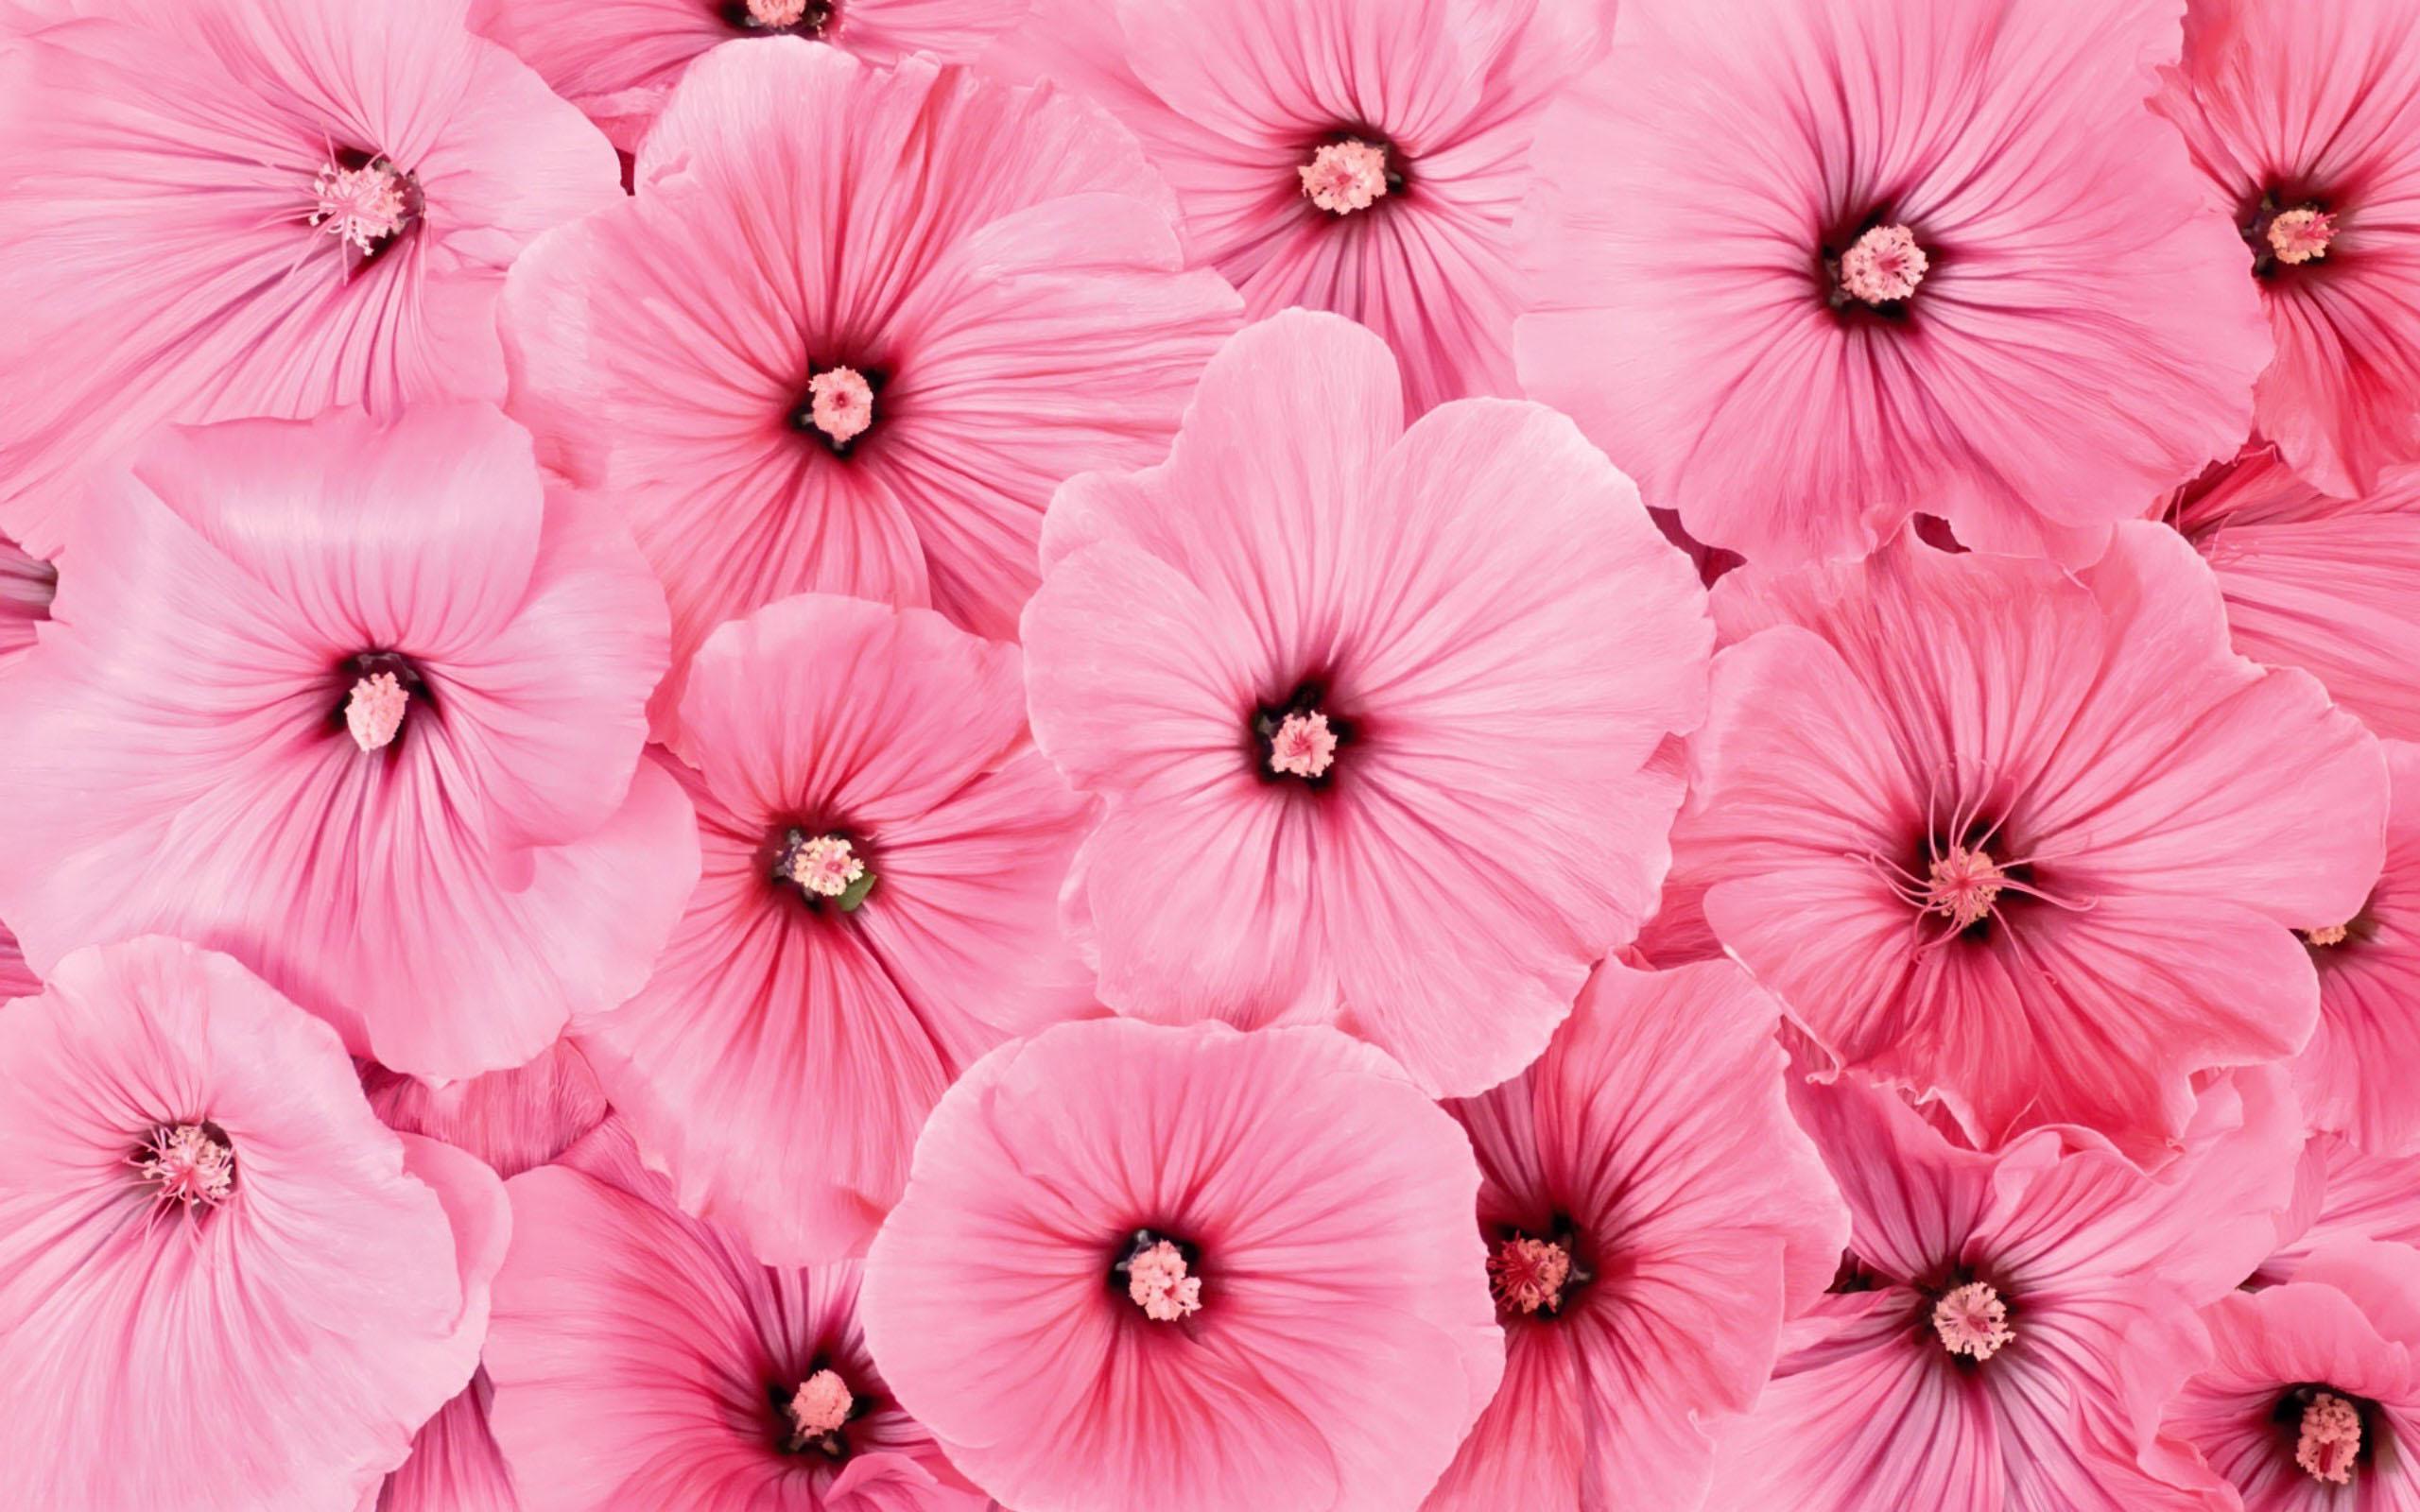 Pink Flowers Wallpaper 2560x1600 51768